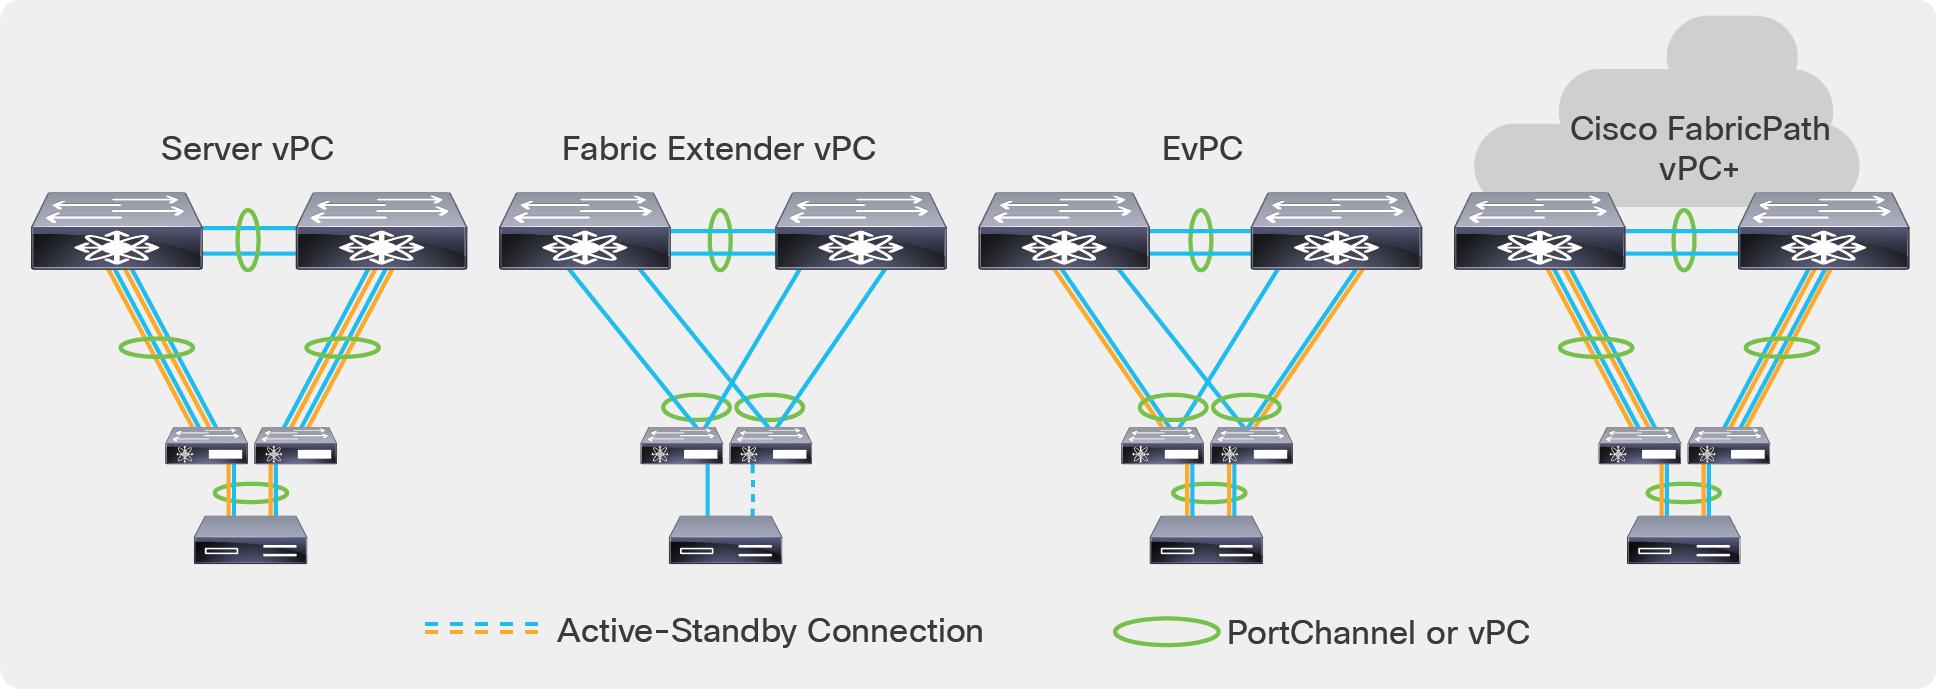 Cisco Nexus 2300 Platform Fabric Extenders Data Sheet - Cisco